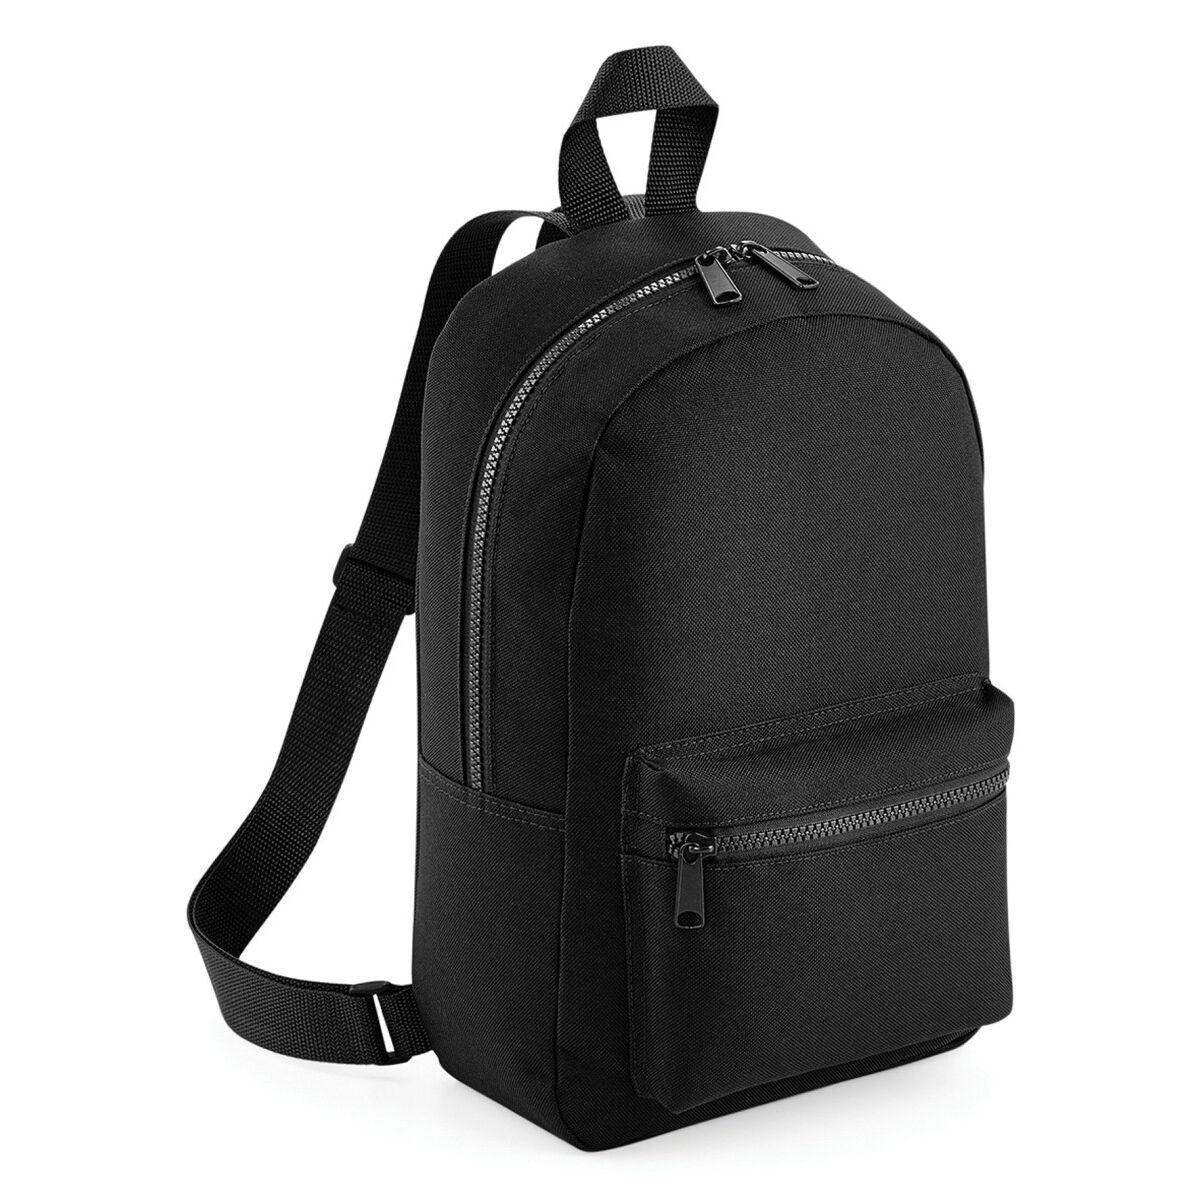 Basebag Fashion Backpack (Black)